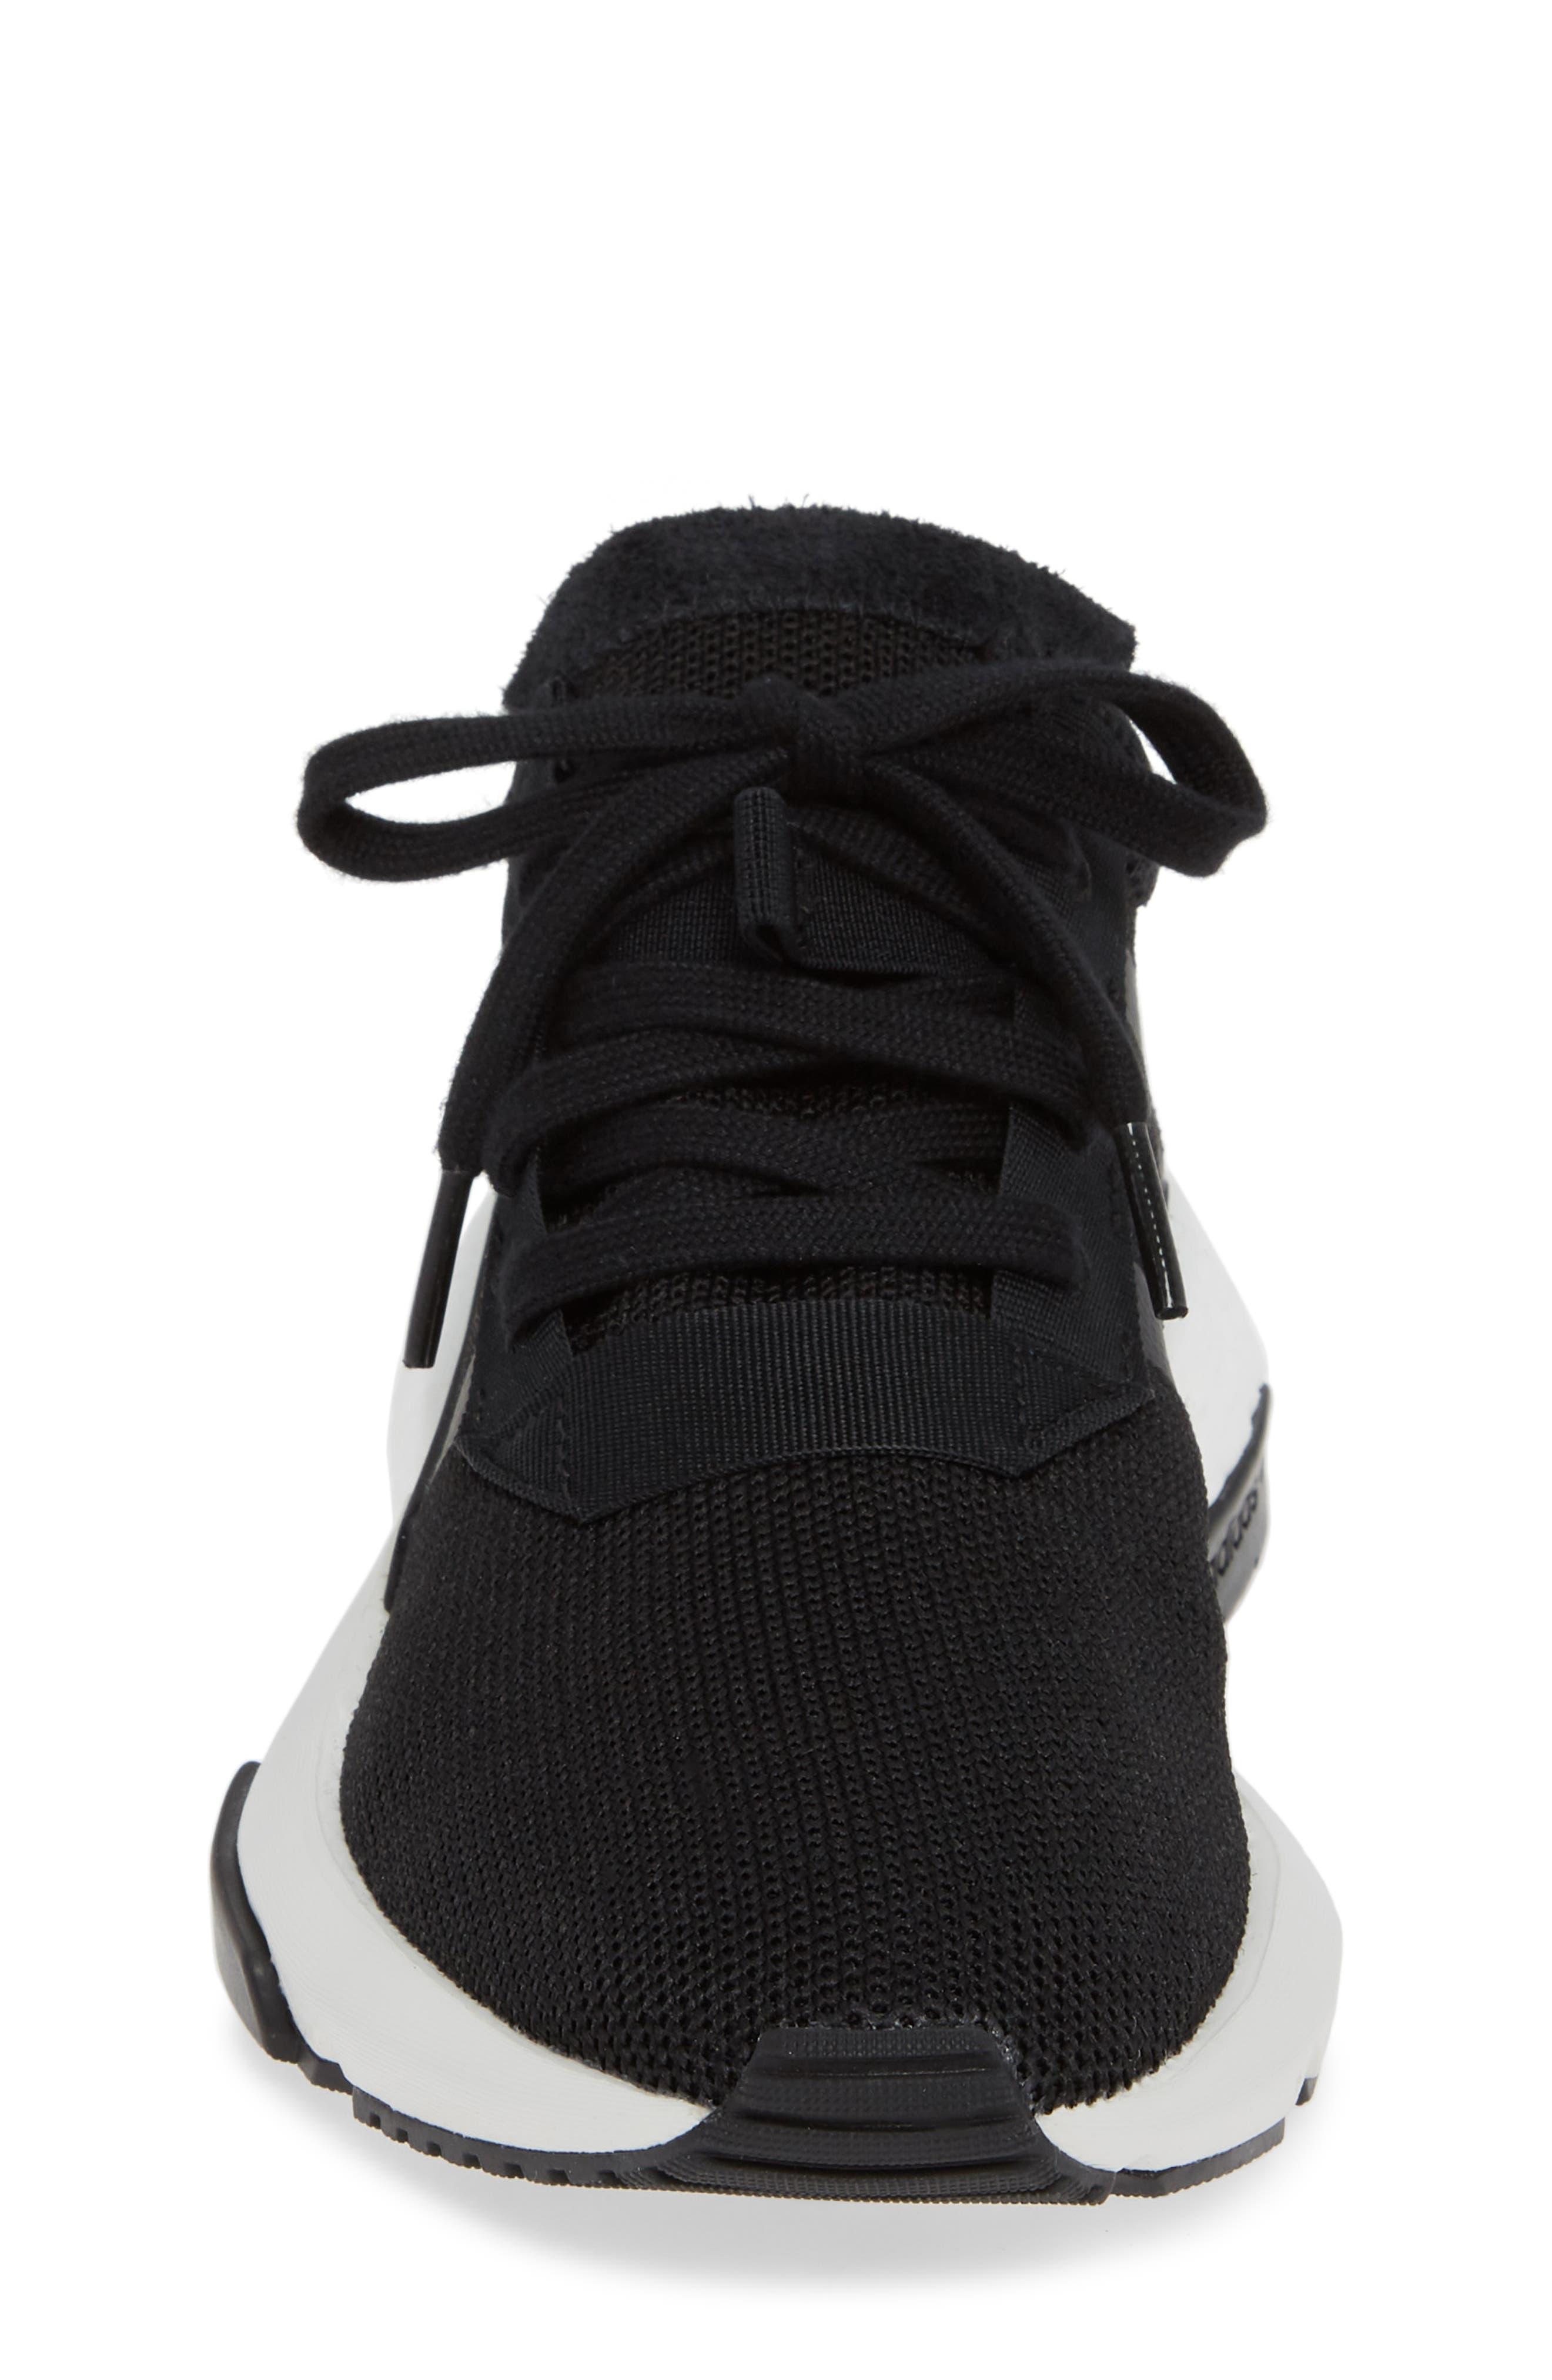 POD-S3.1 Sneaker,                             Alternate thumbnail 4, color,                             CORE BLACK/ BLACK/ LEGEND IVY